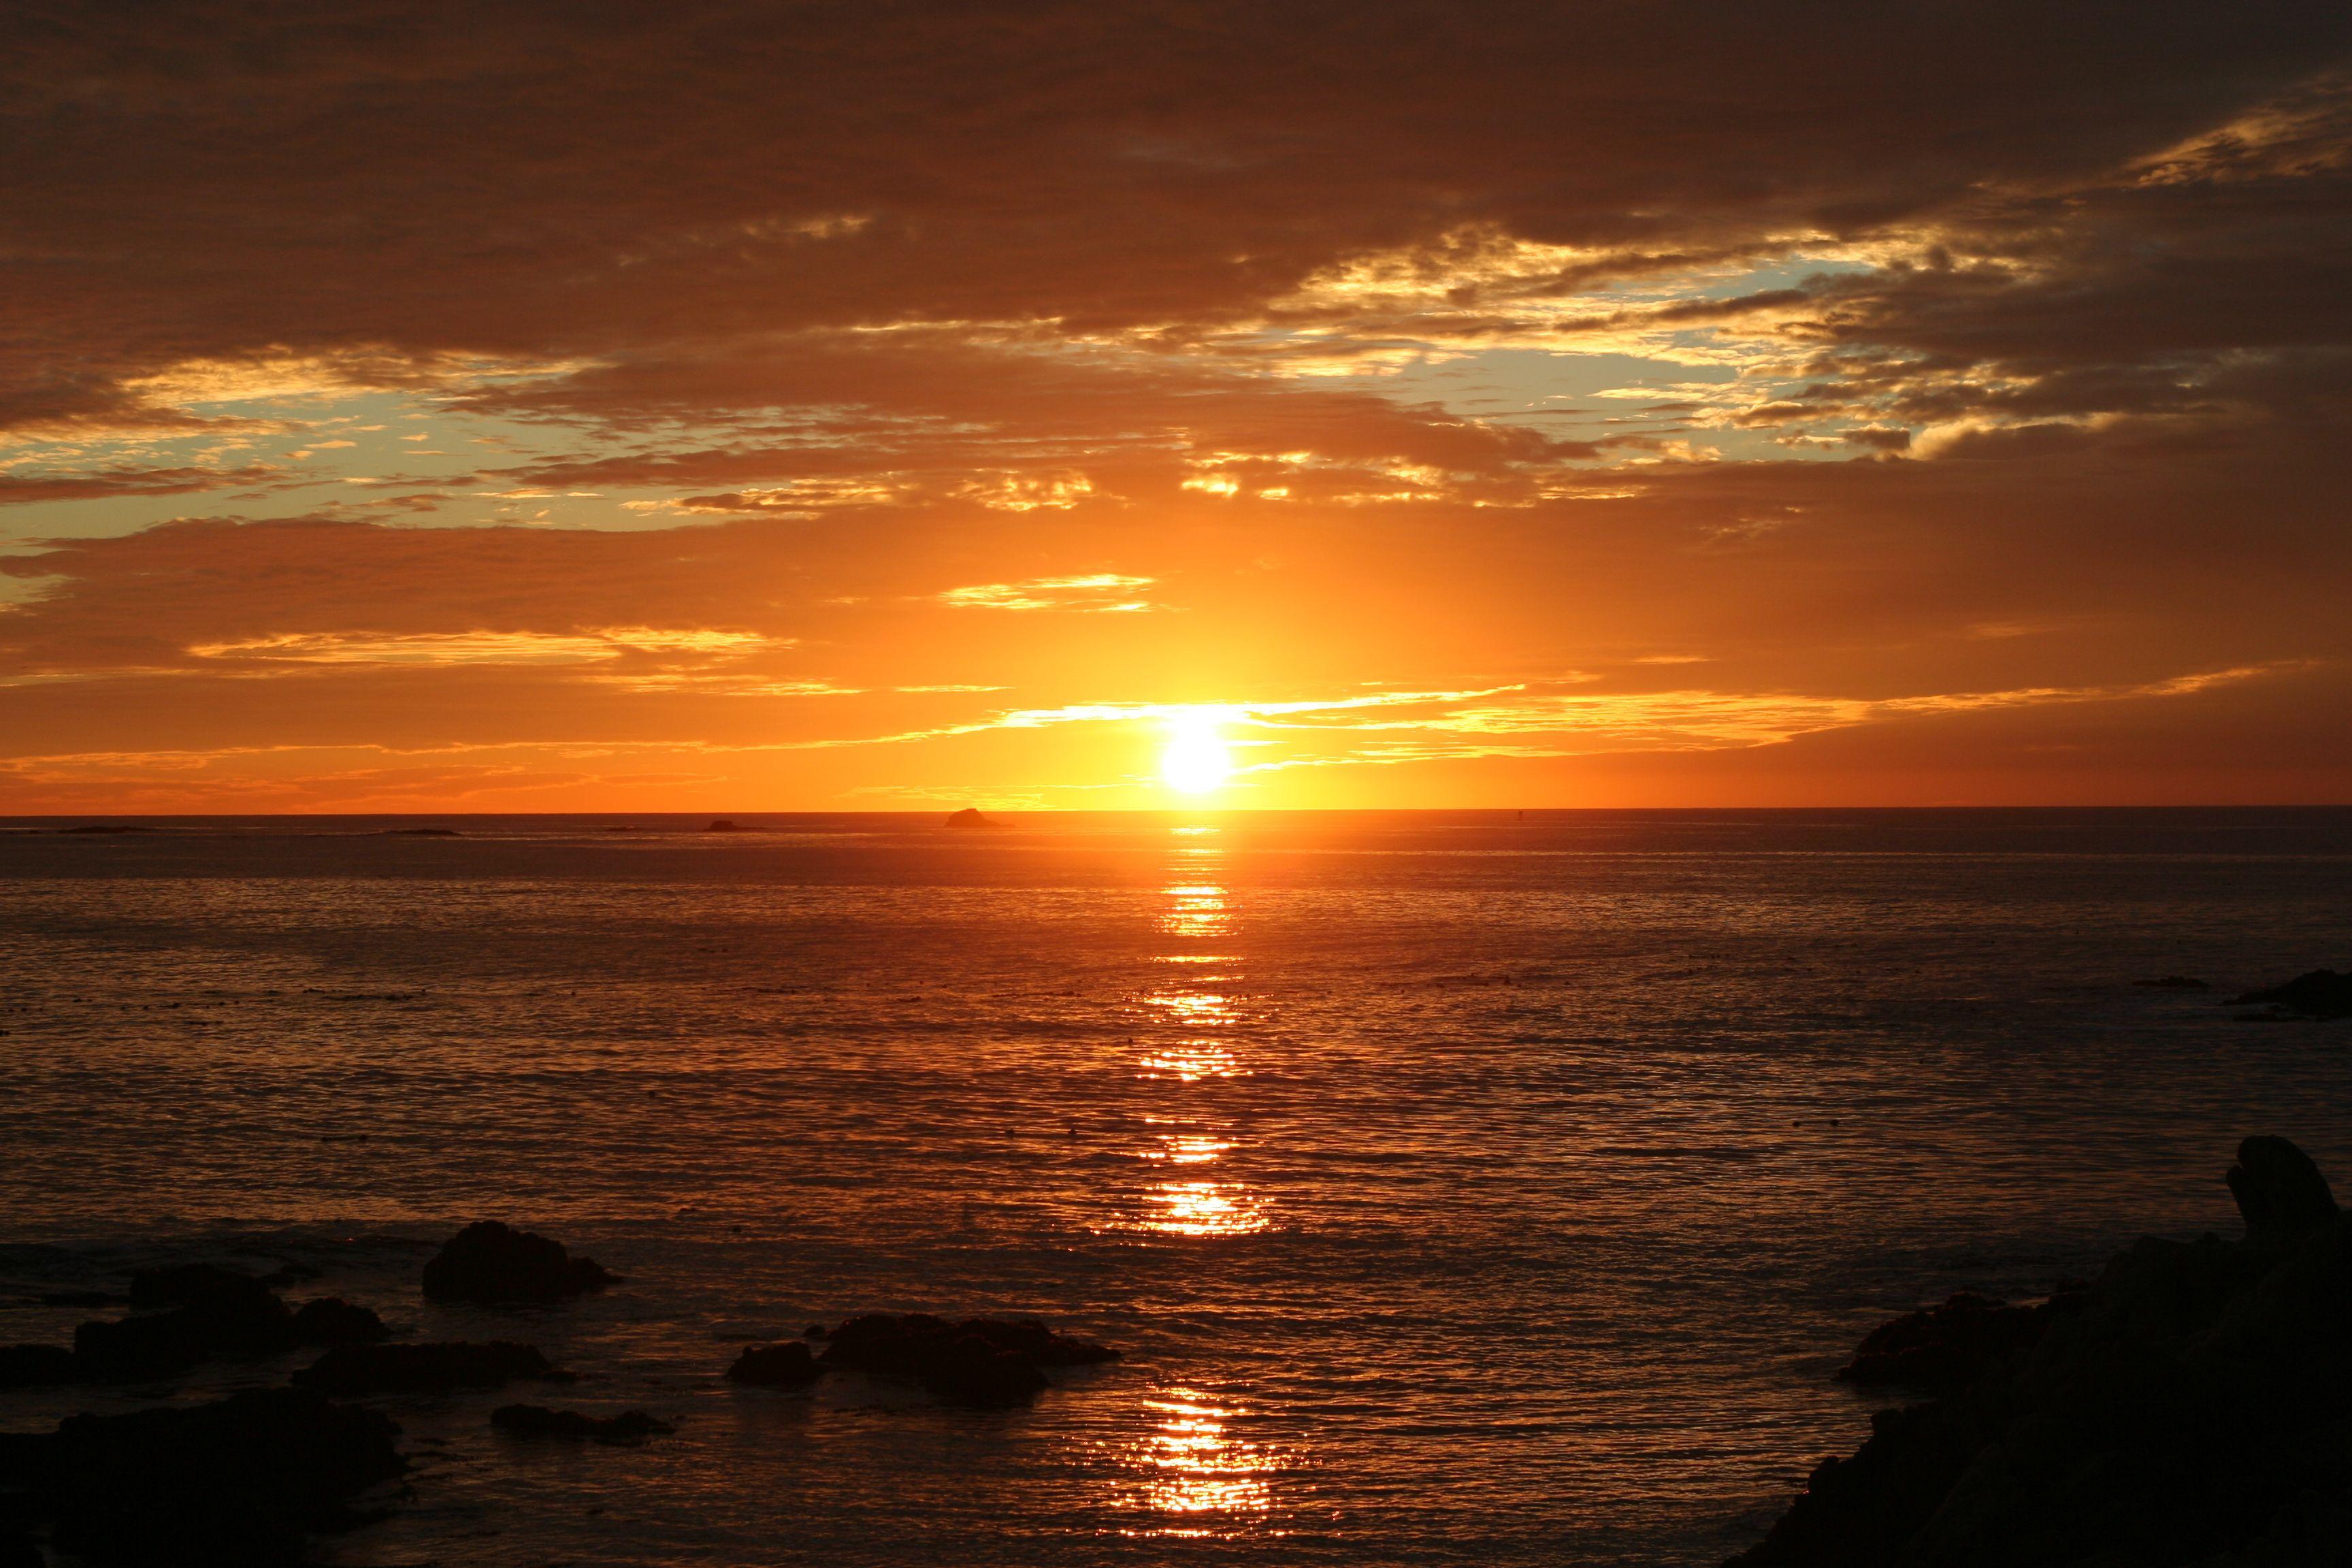 download free ocean images my photo bag sunrise sunset